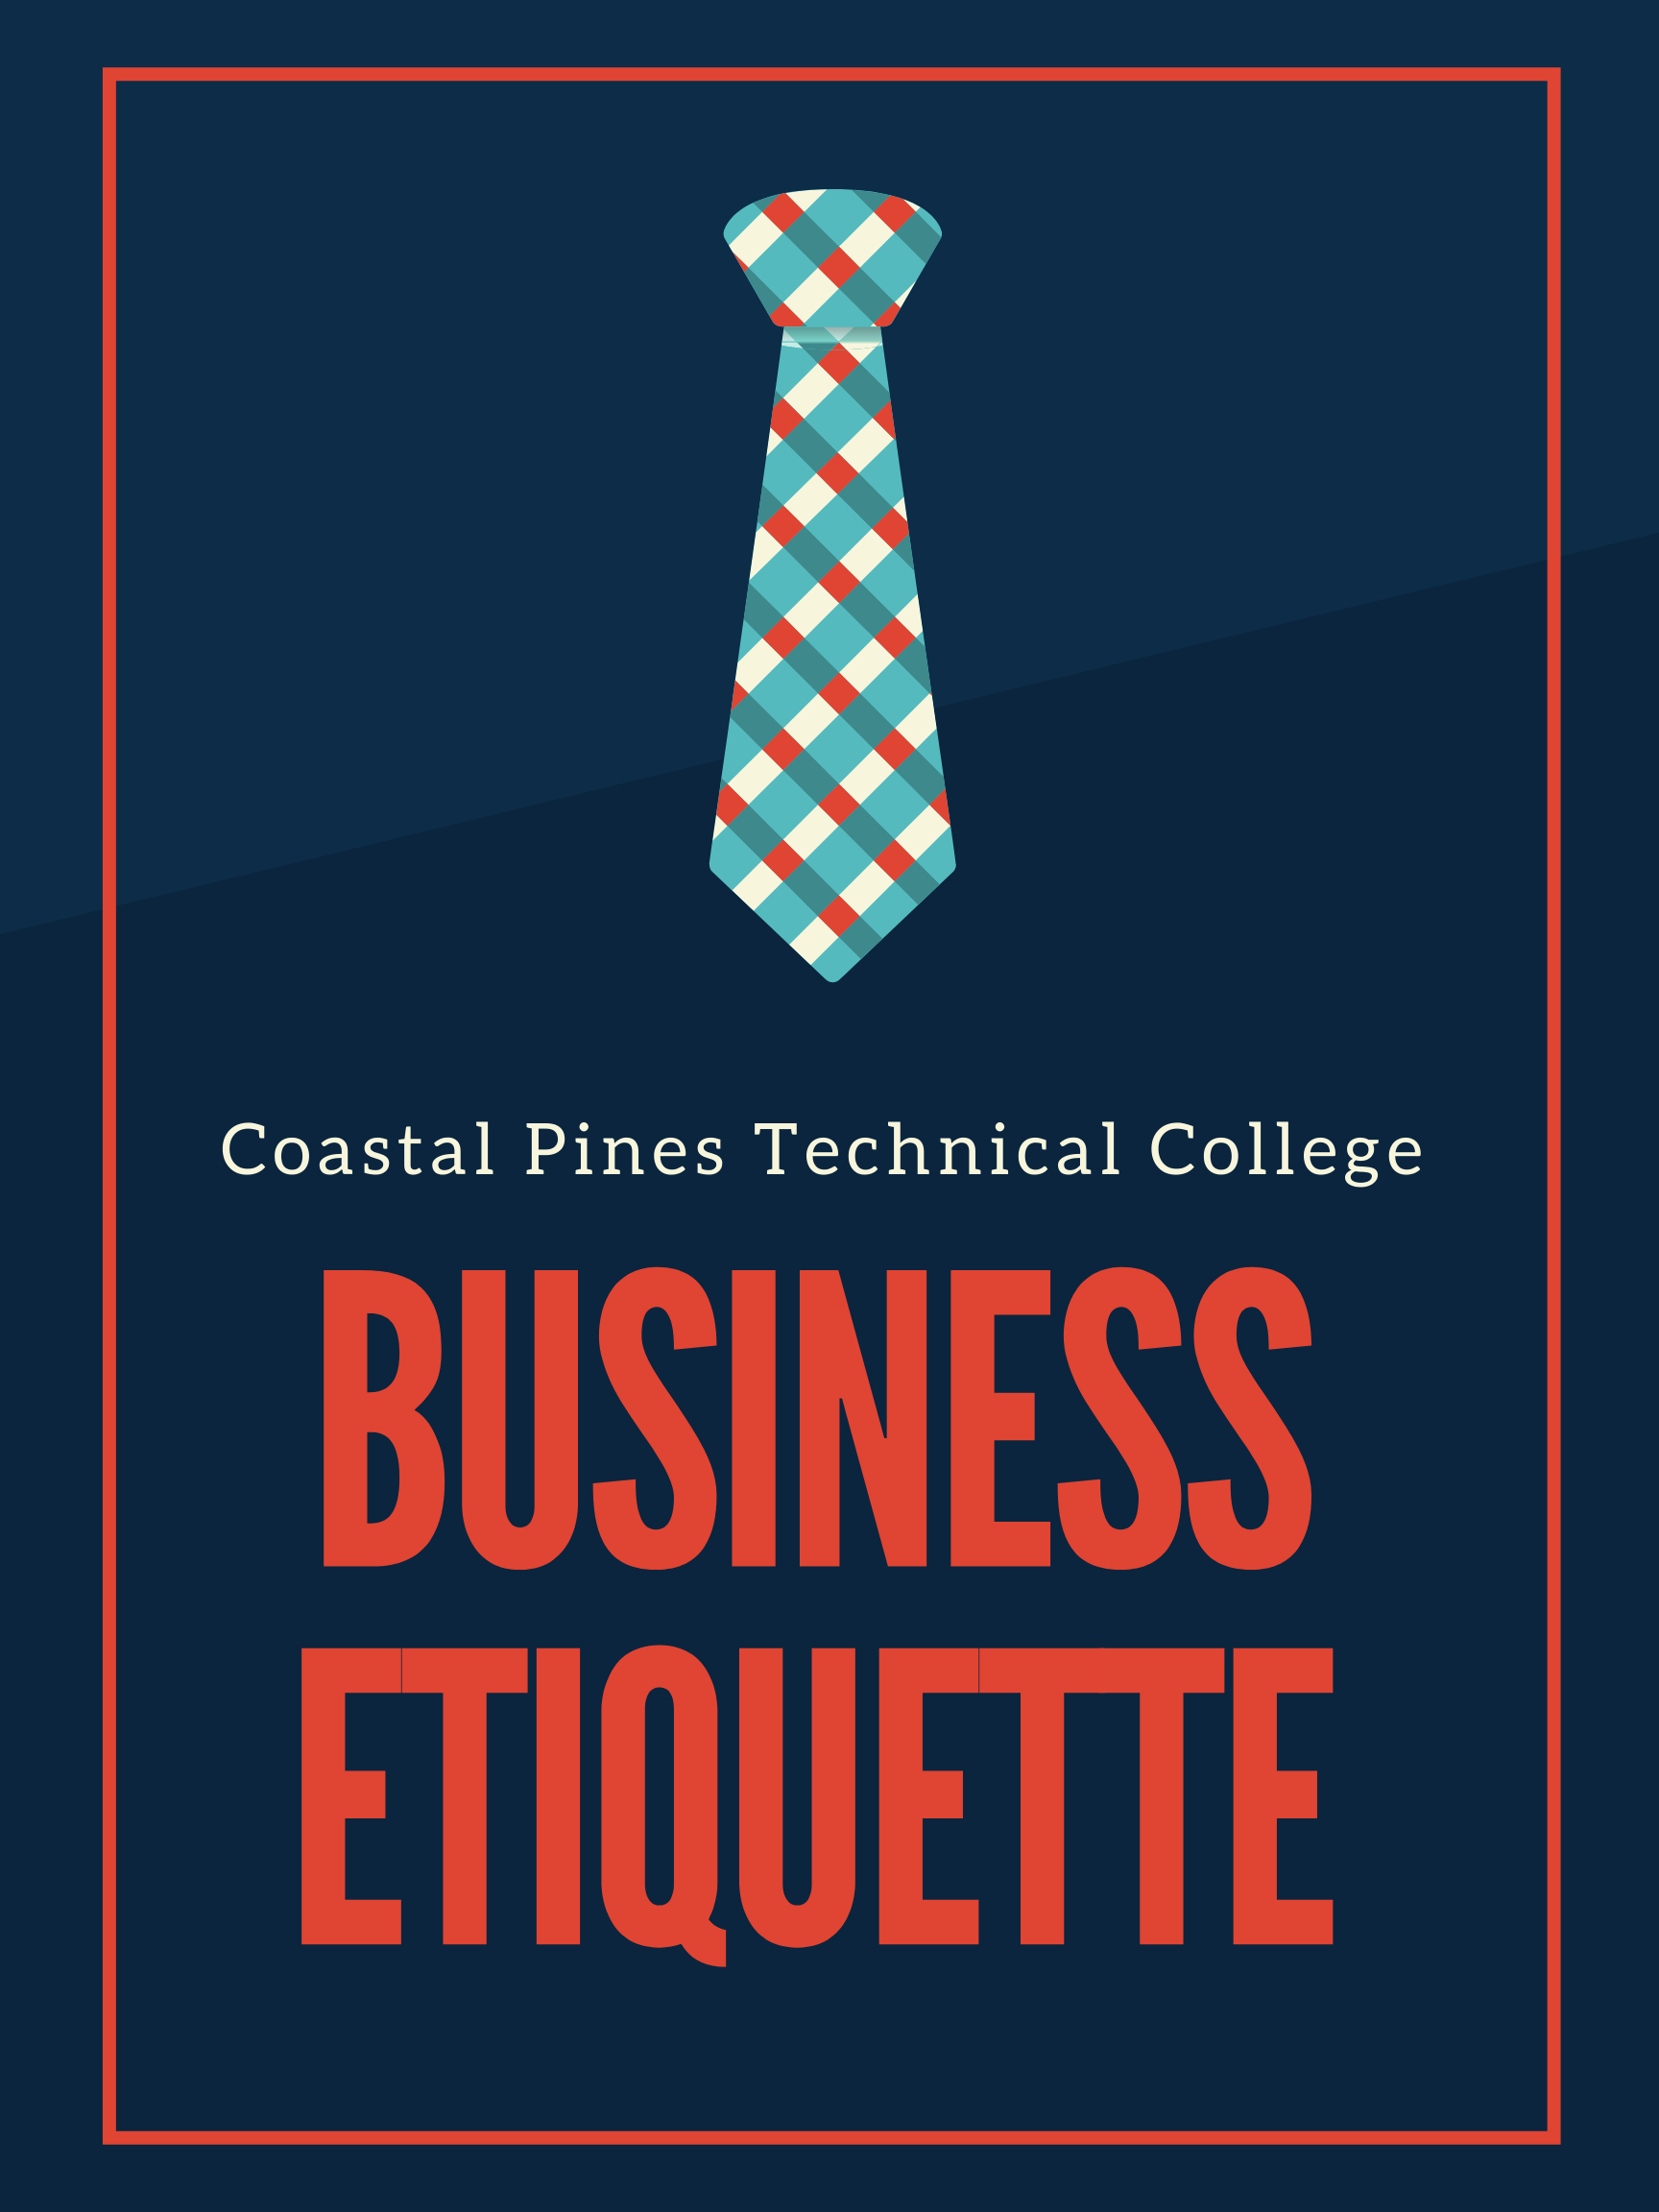 Coastal Pines Technical College Business Etiquette